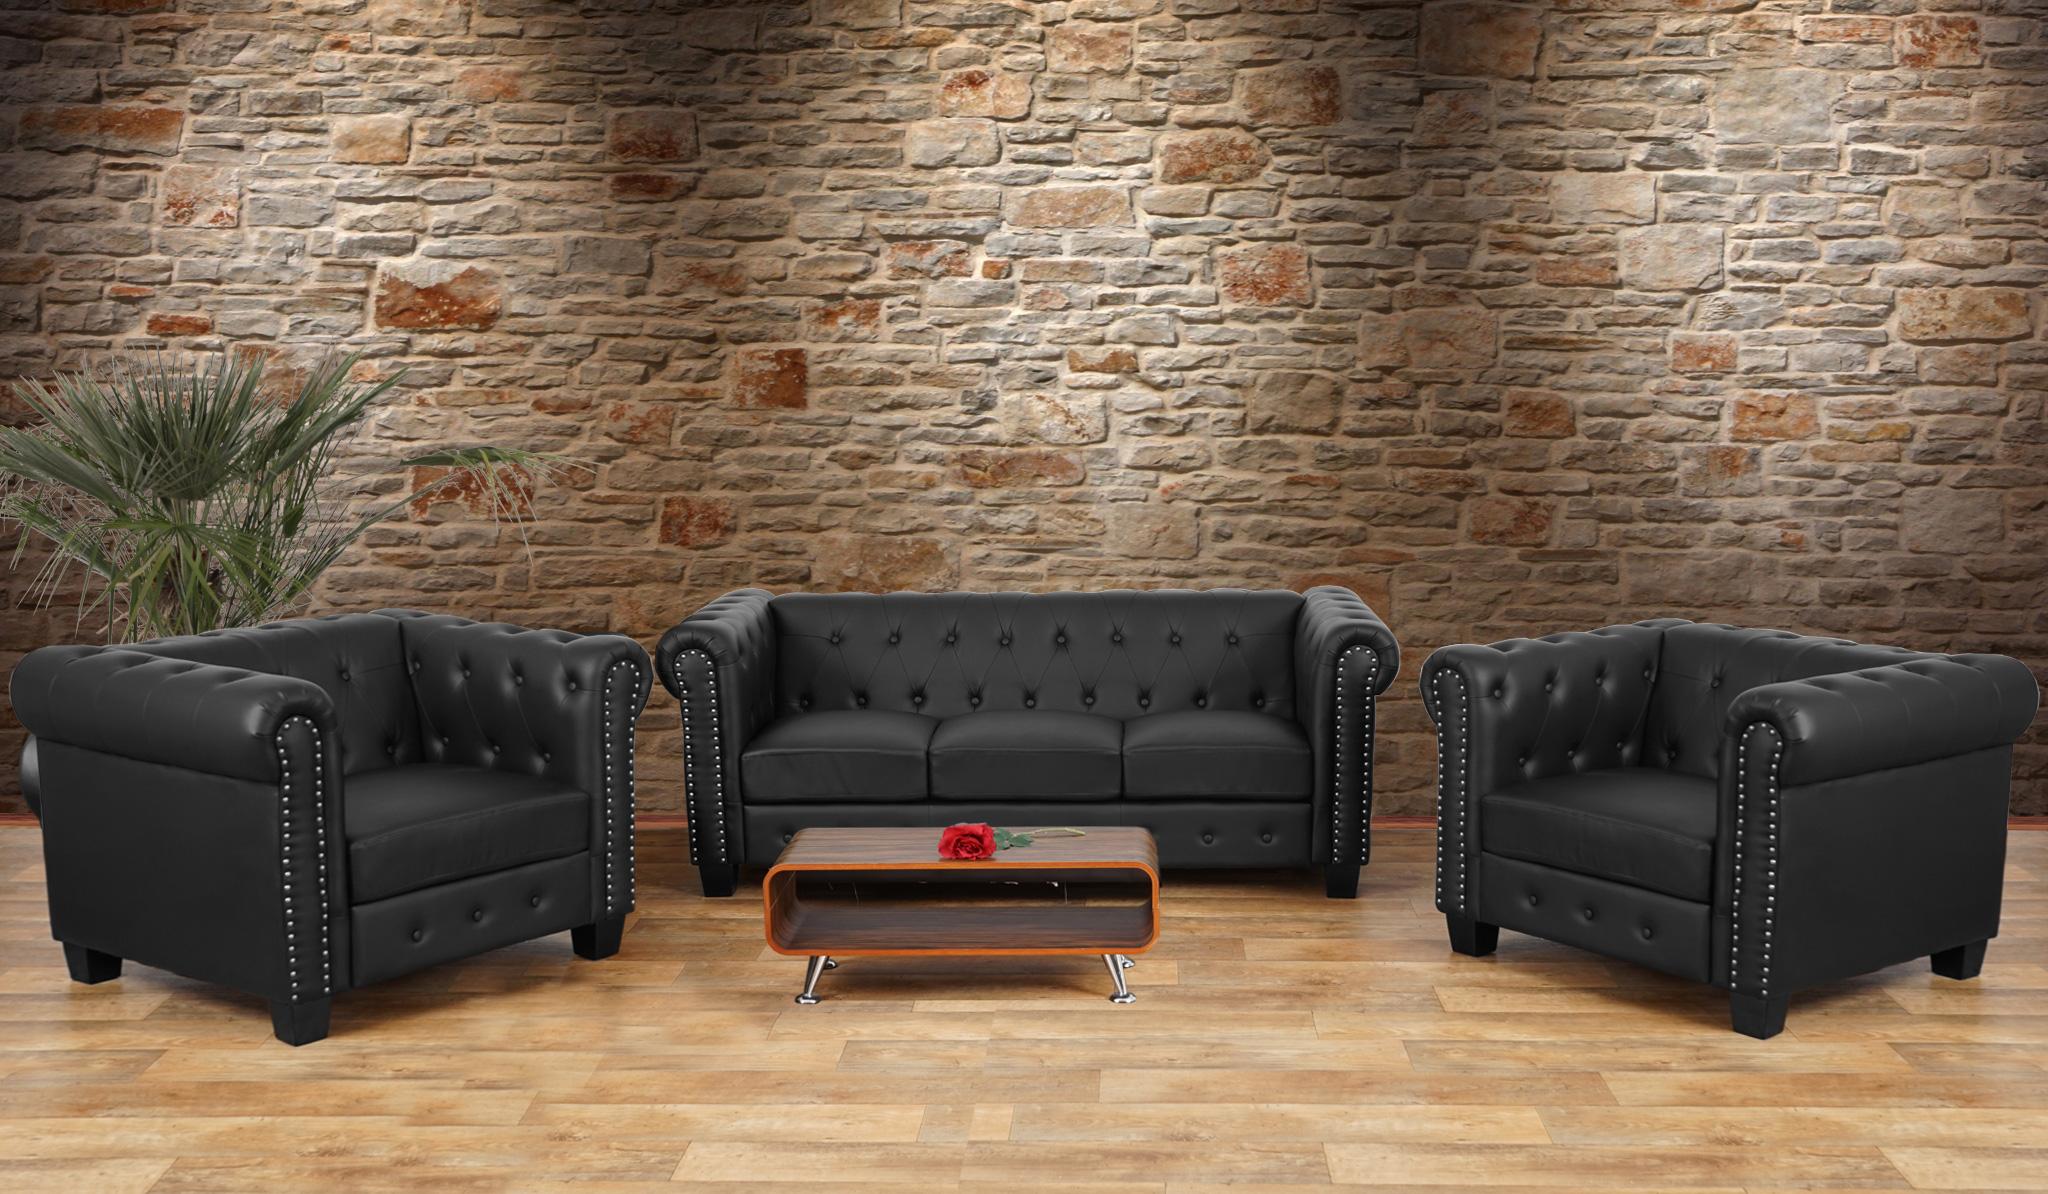 luxus 3 1 1 sofagarnitur couchgarnitur loungesofa chesterfield kunstleder eckige f e schwarz. Black Bedroom Furniture Sets. Home Design Ideas